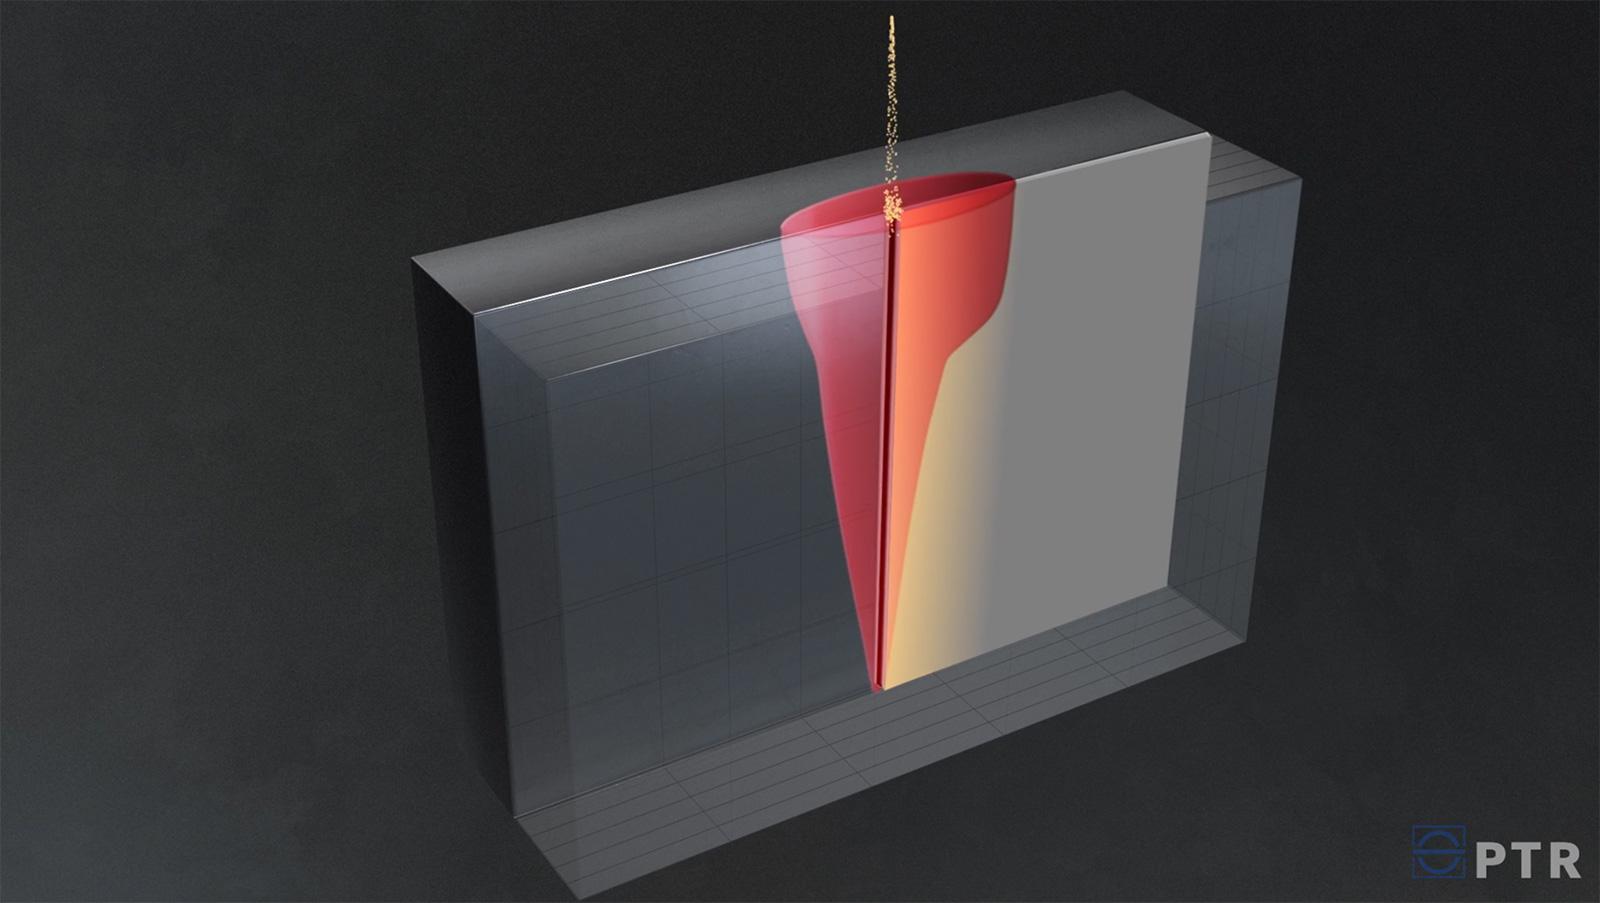 PTR Precision Technologies Electron Beam Welding